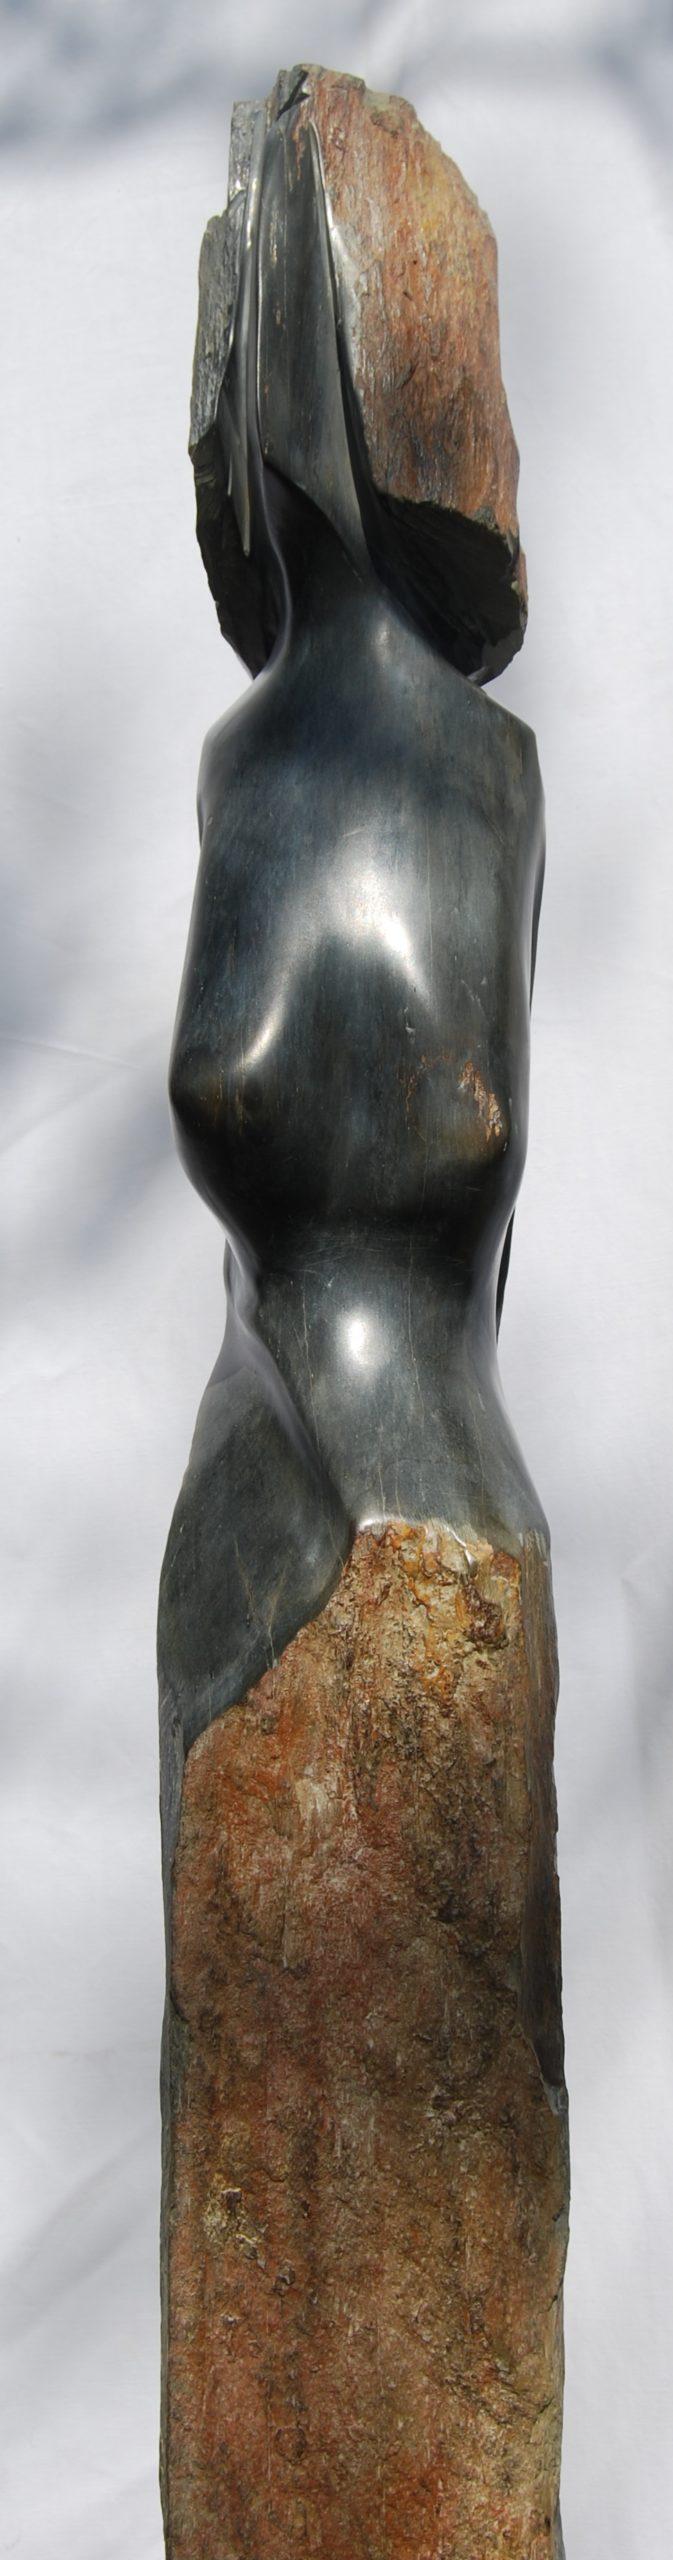 sculpture ariza de Claude Bertrand